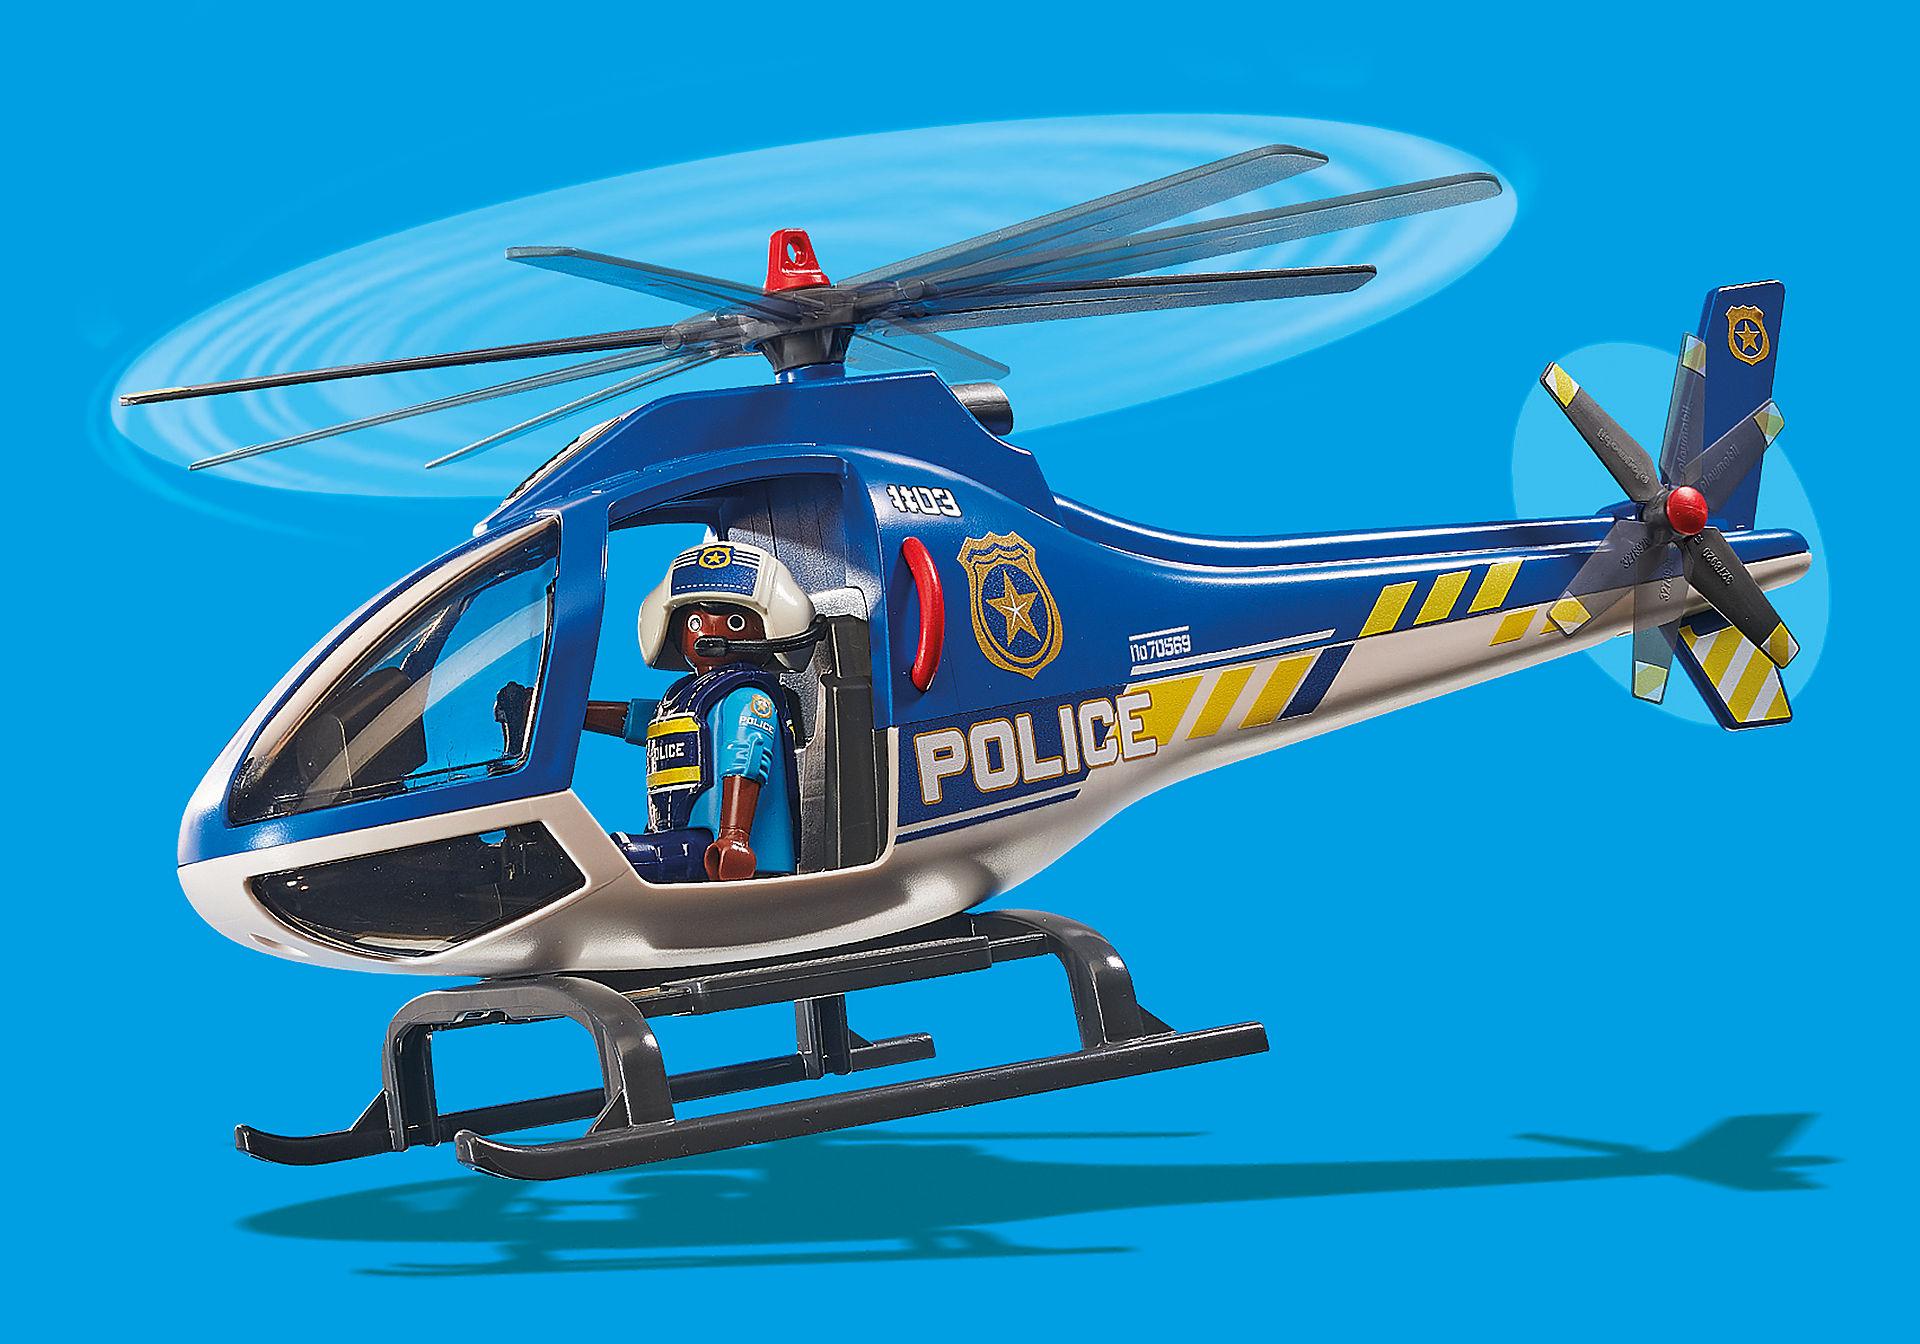 70569 Helicóptero de Policía: persecución en paracaídas zoom image6